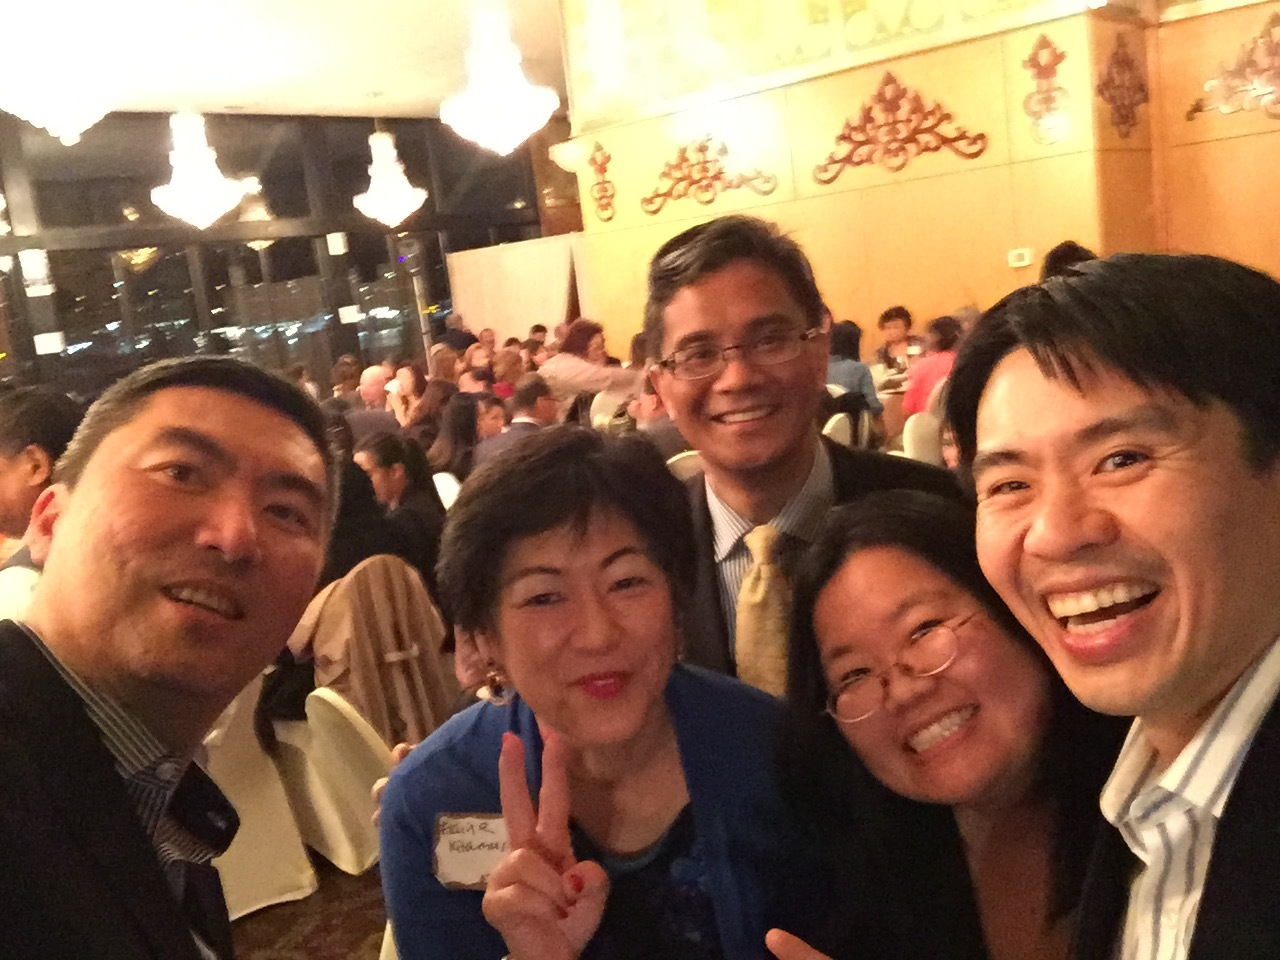 NW Asian Weekly Visionary Gala   Left to Right: Victor Chow, Elaine Kitamura (EDI Class of 1997), Ador Yano (EDI Class of 2004), Marci Nakano (EDI Executive Director & Class of 2005), Andreas Winardi (EDI Class of 2014)